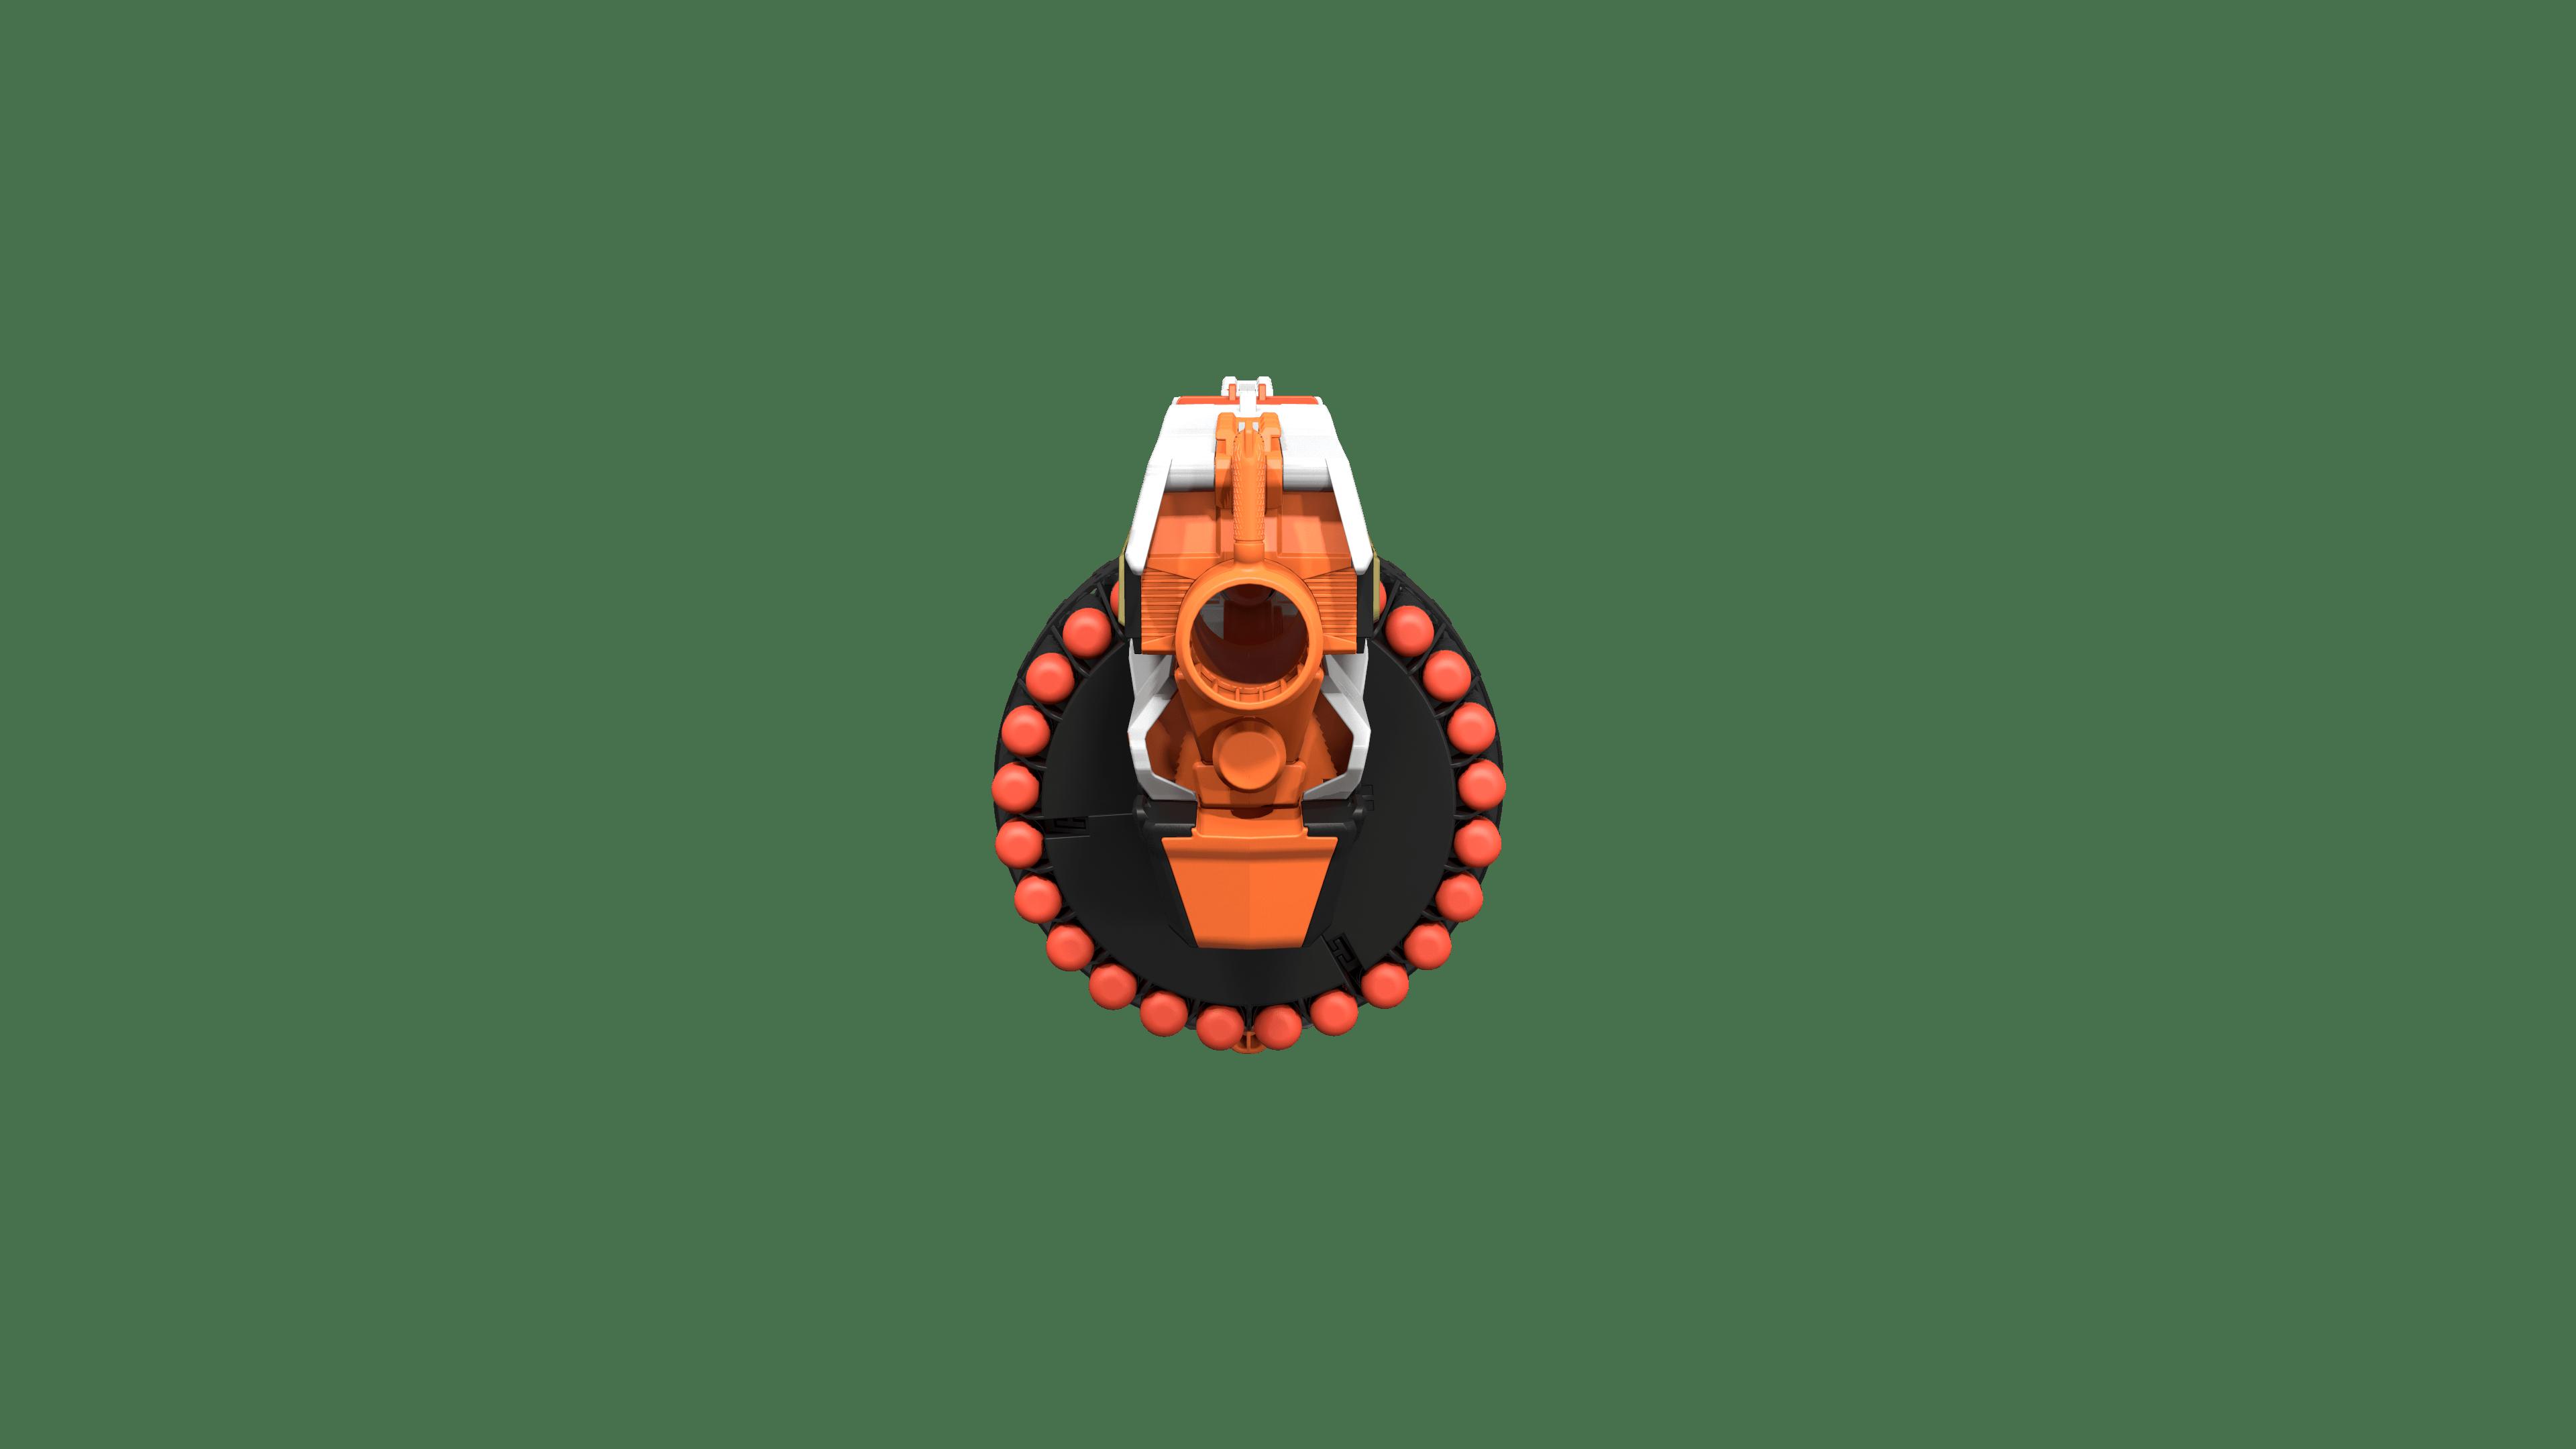 ultra blaster img 91